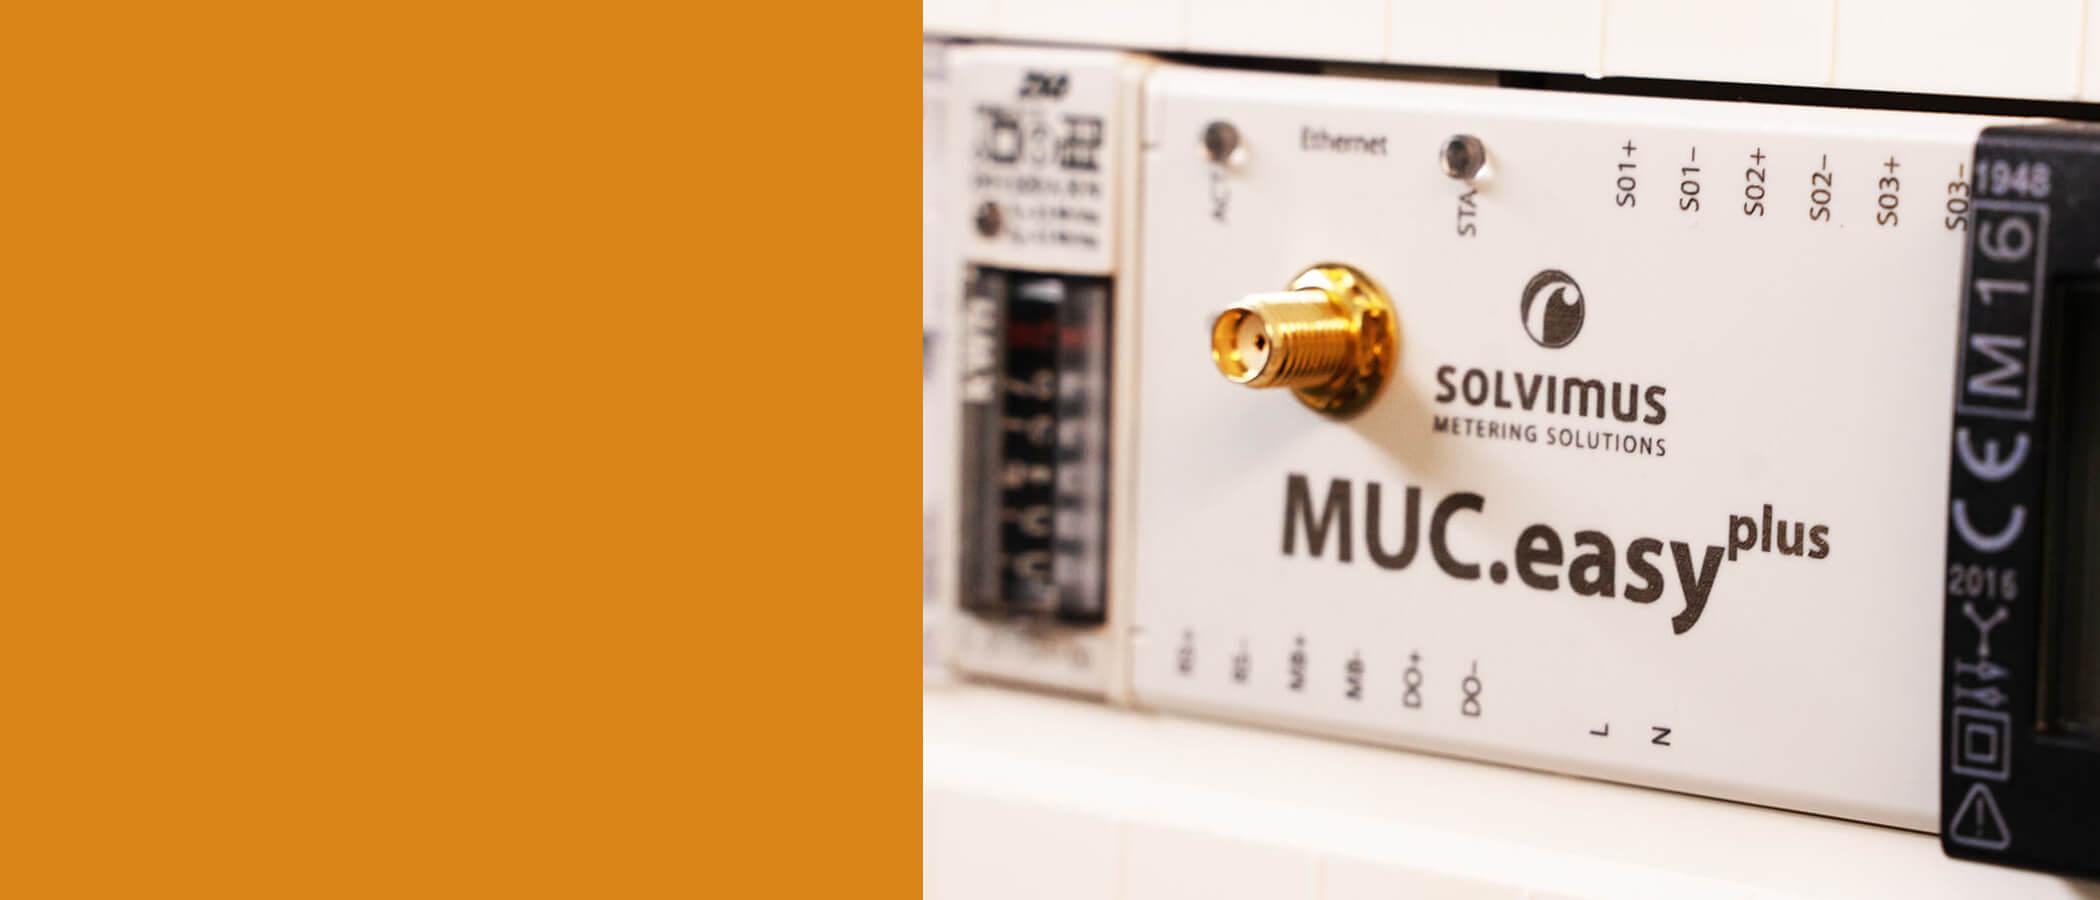 Header MuceasyPlus solvimus nah